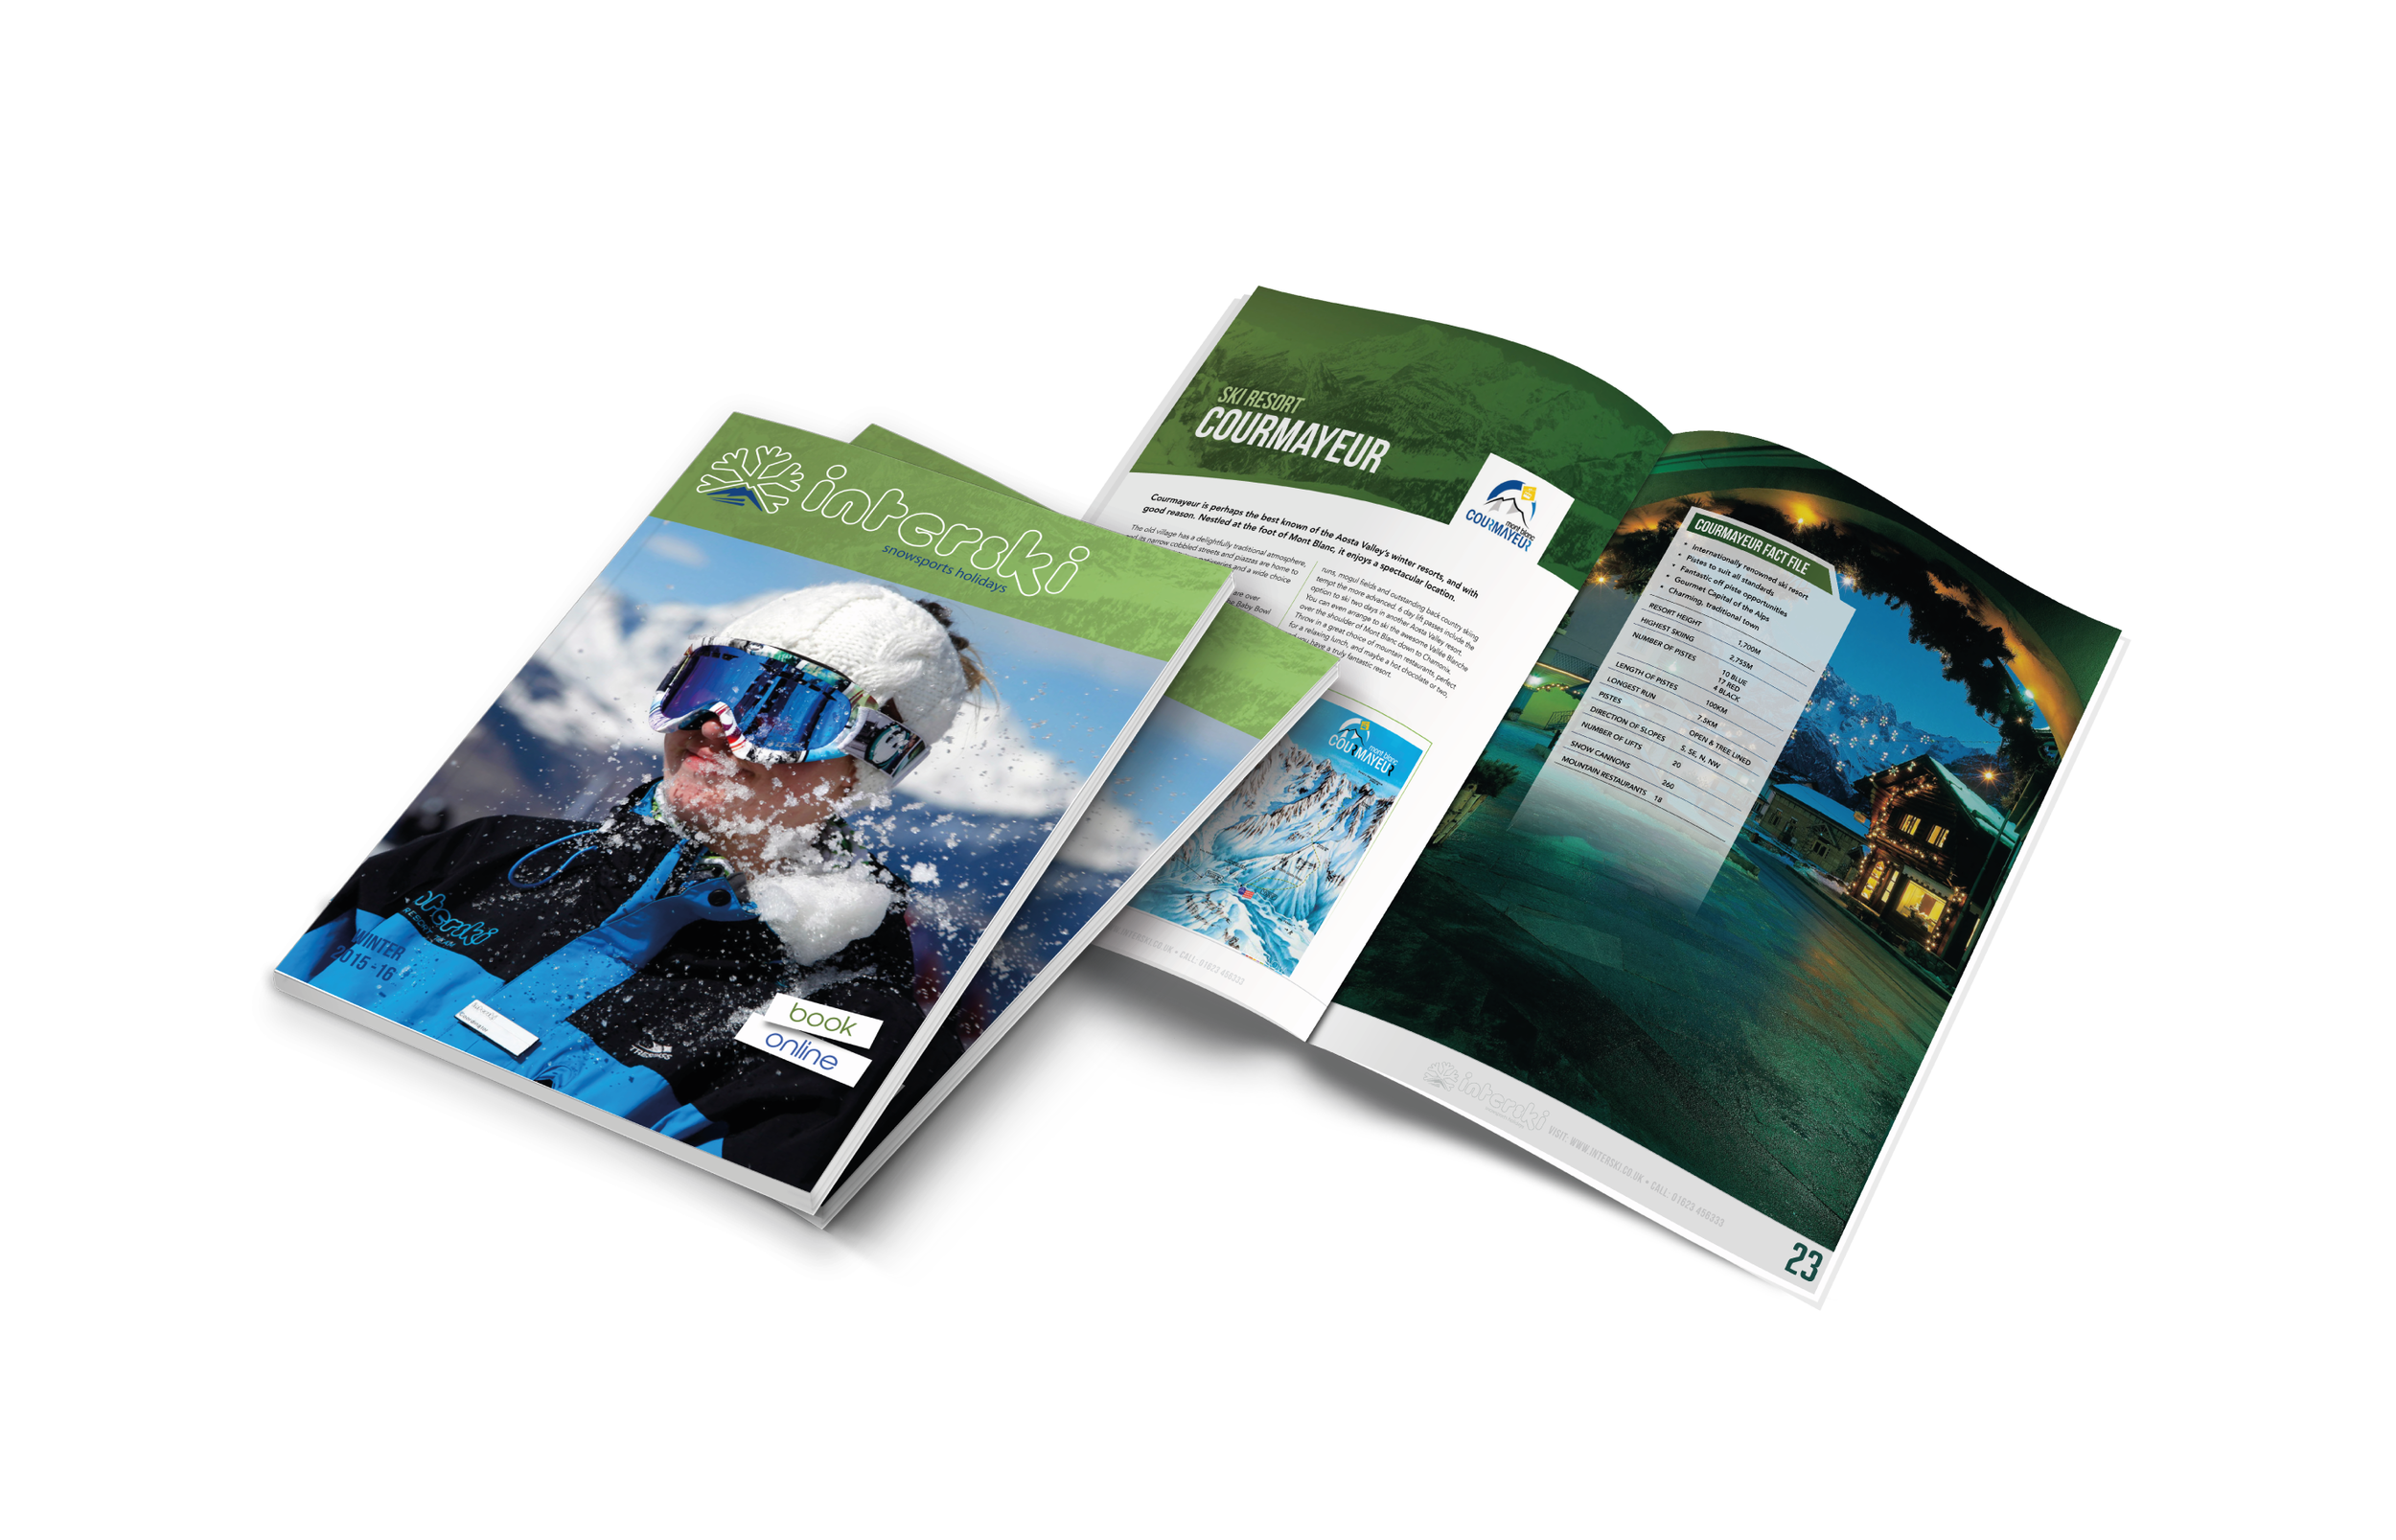 2015/16 Brochure Design for Interski, a Snowsports Holiday Company